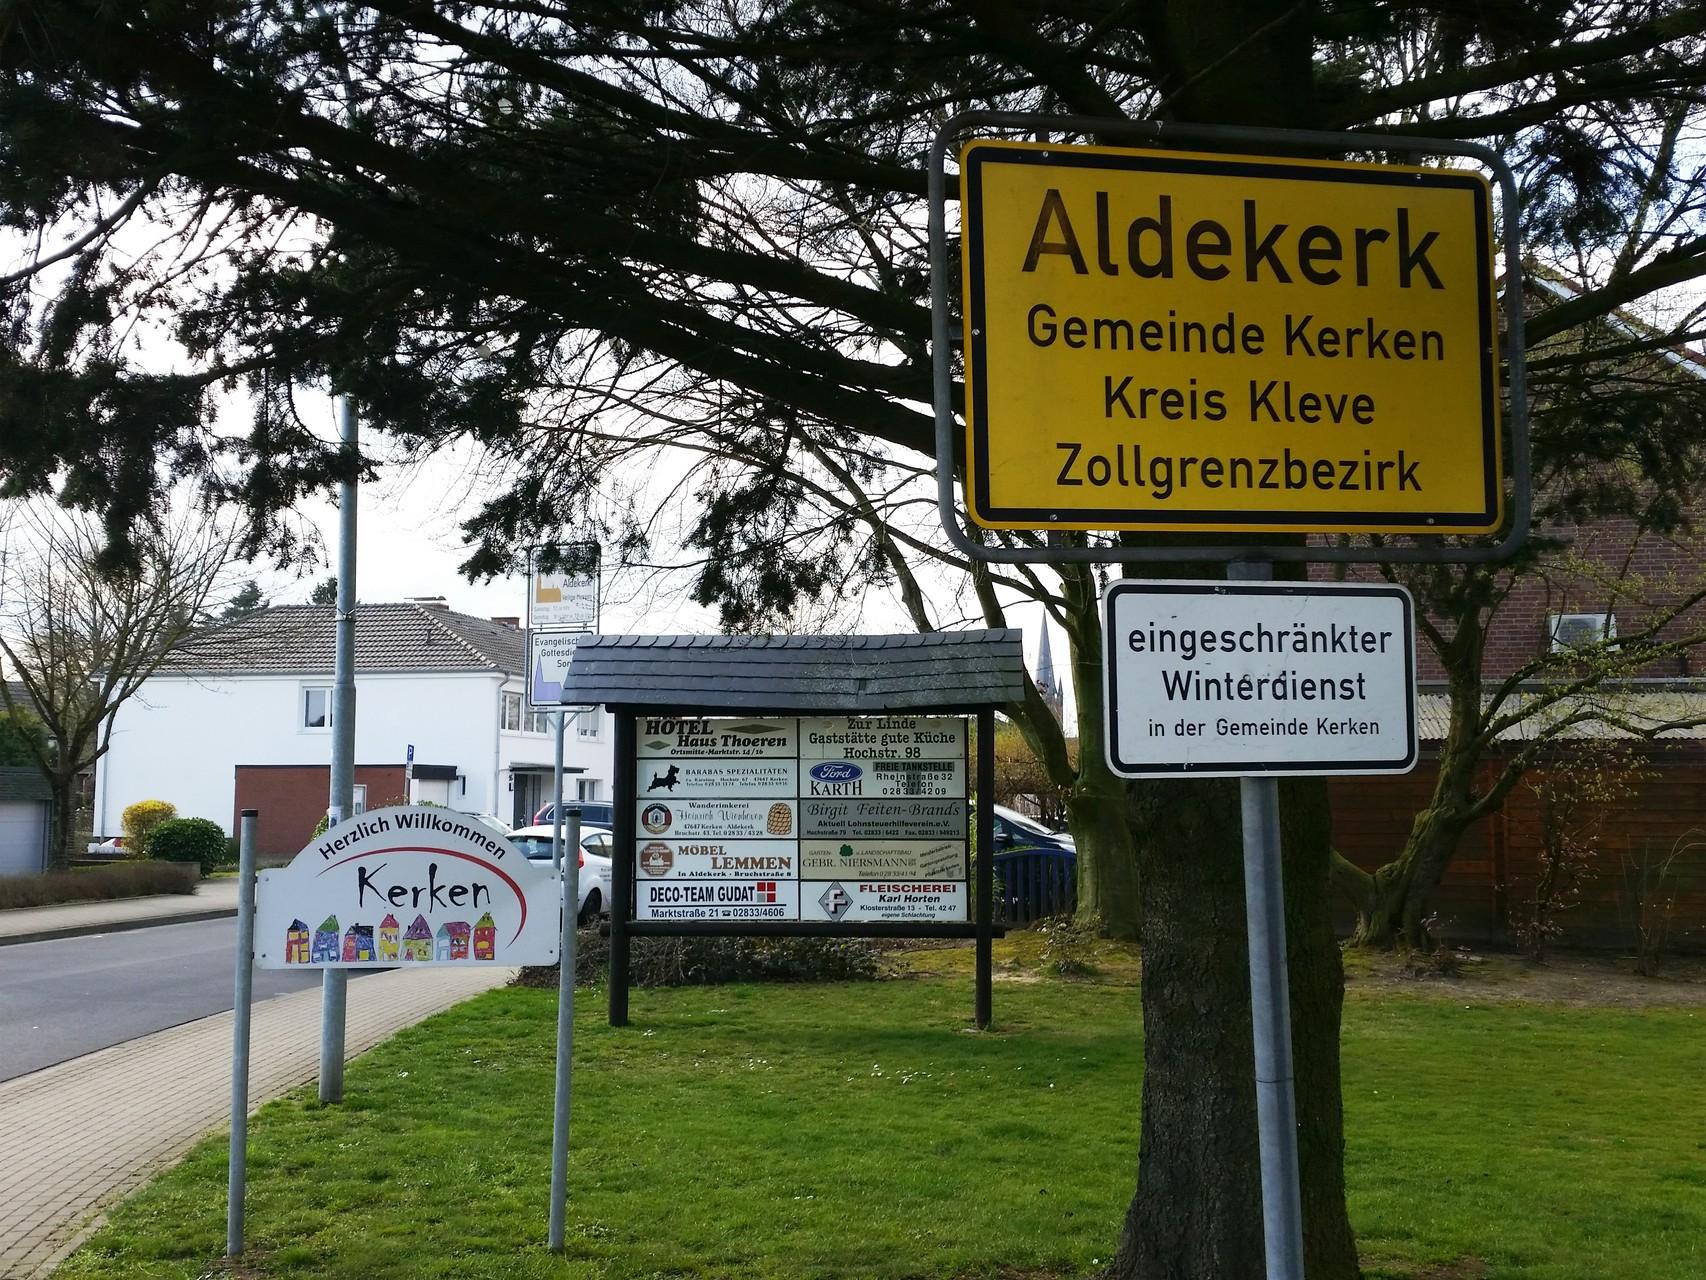 Herzlich willkommen in Aldekerk